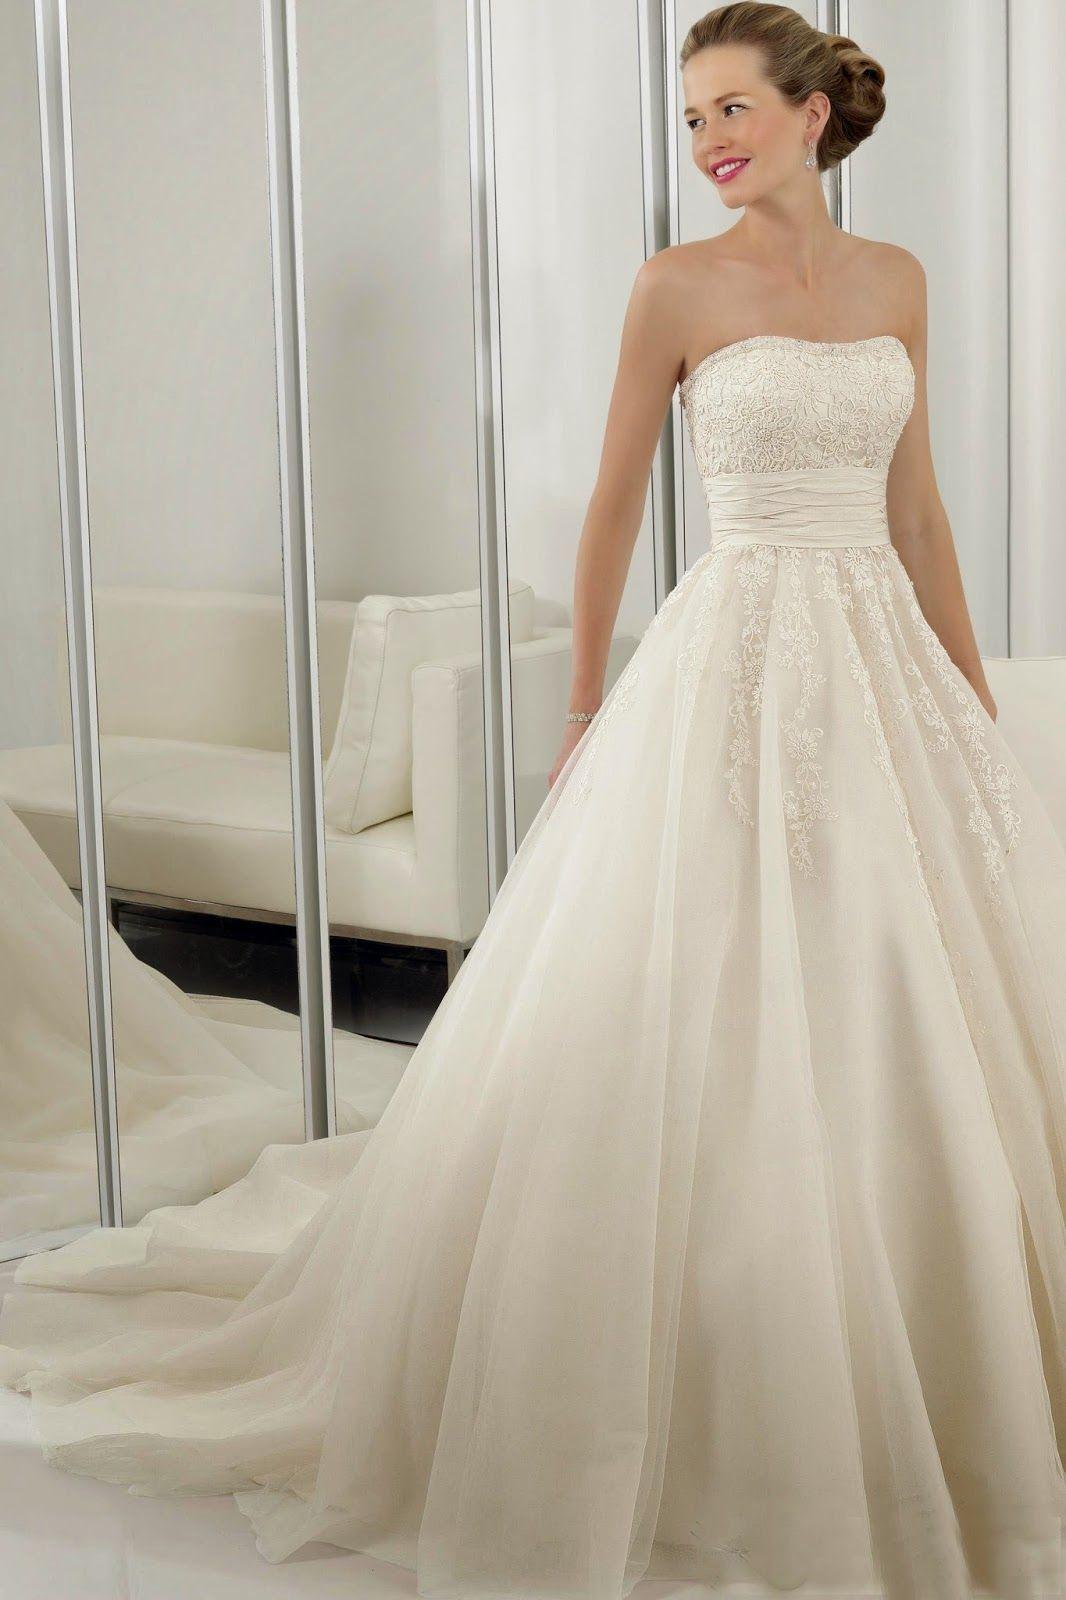 Aline wedding dresses wedding concept ideas pinterest dress